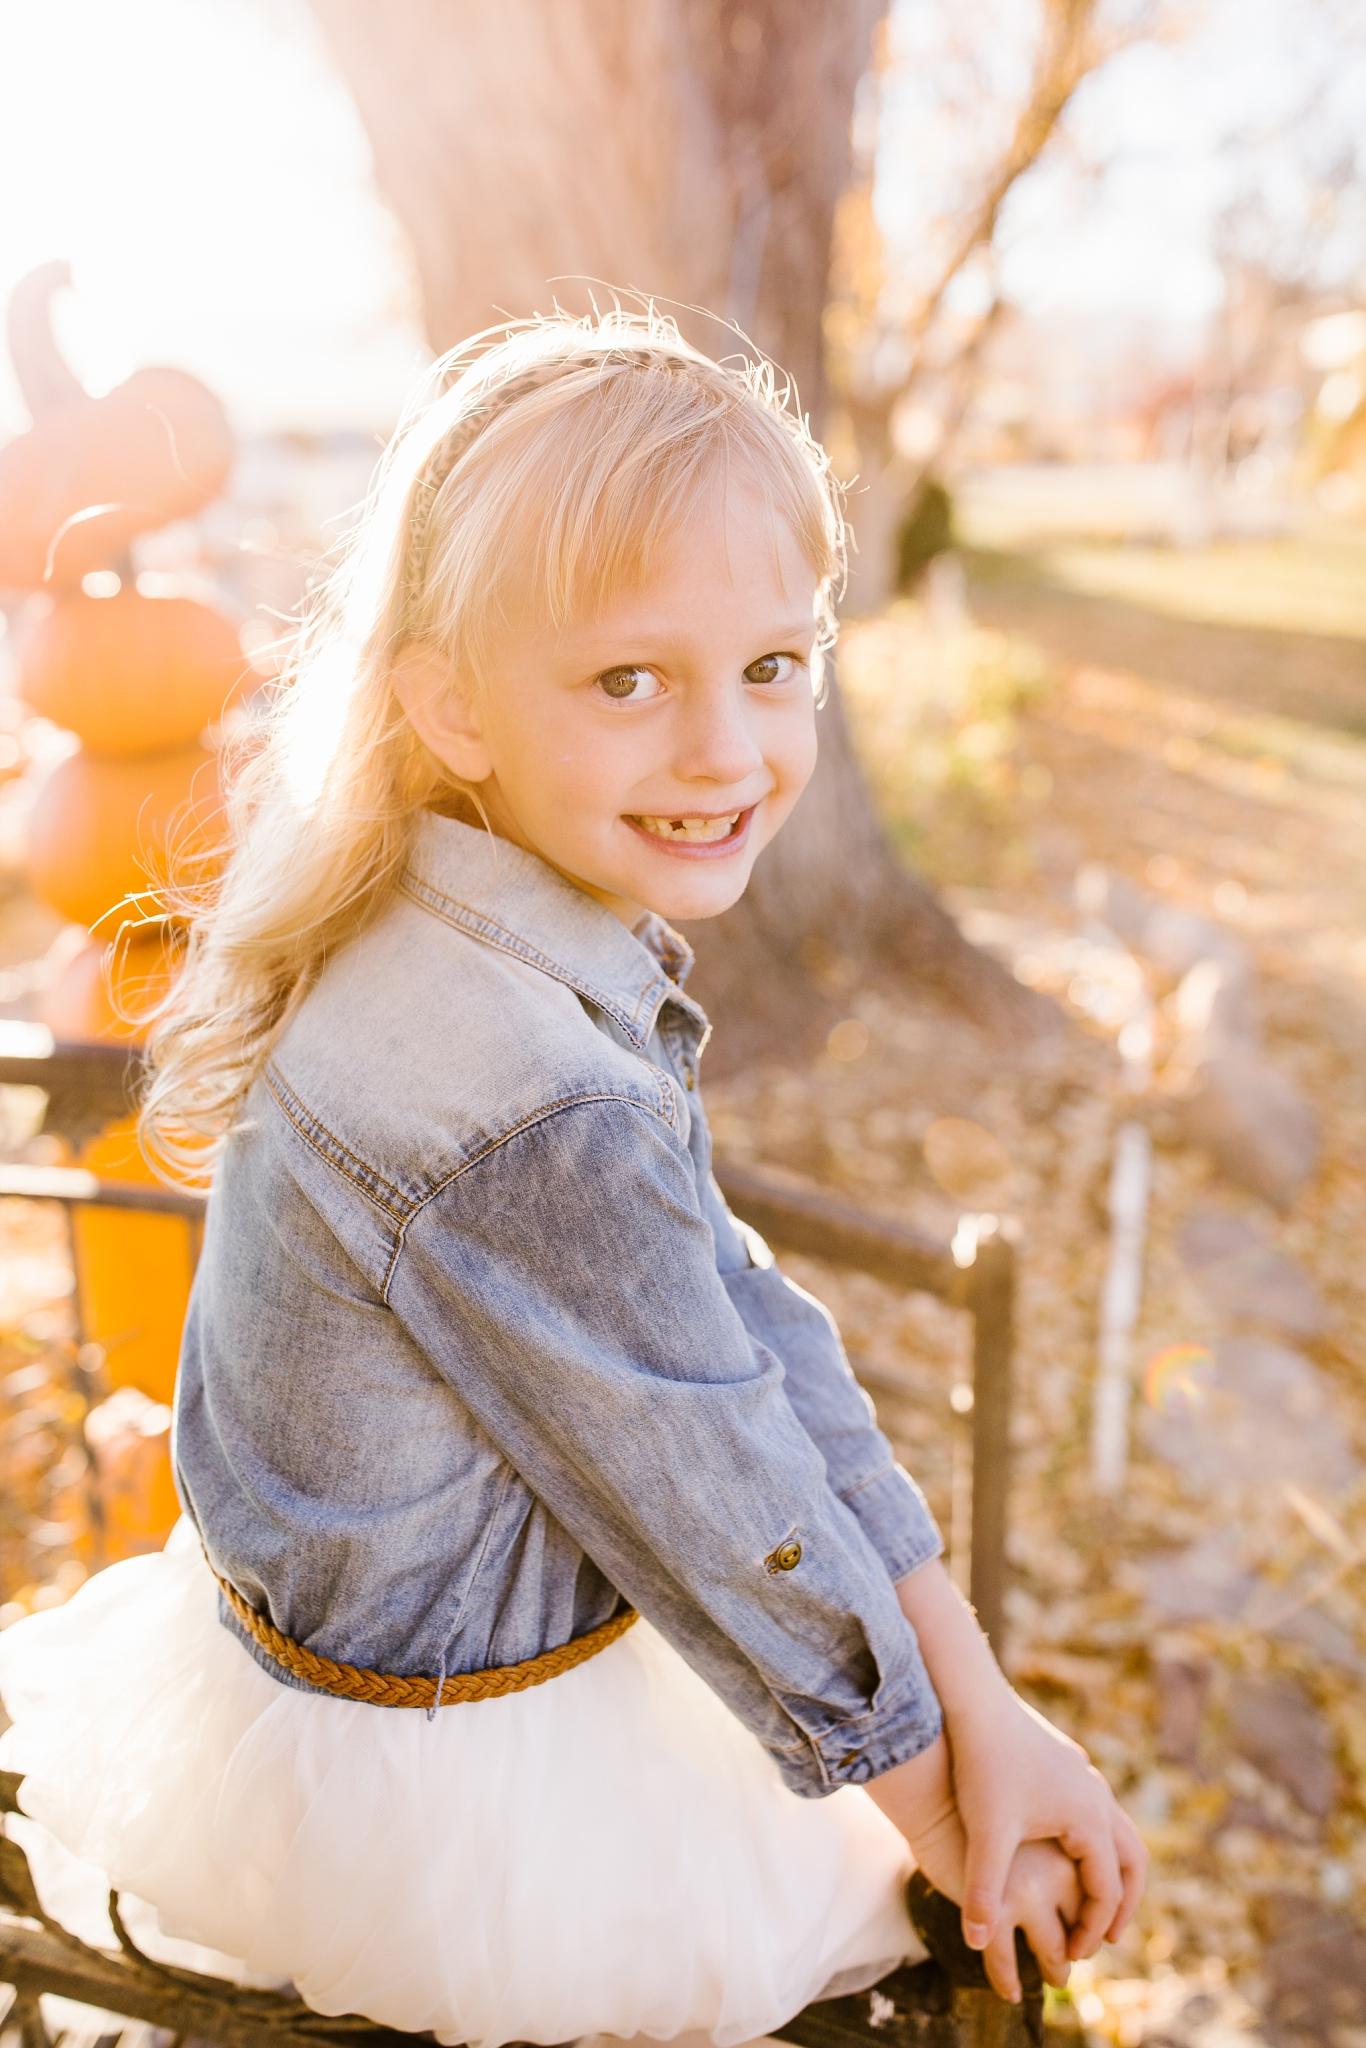 Mickelsen-23_Lizzie-B-Imagery-Utah-Family-Photographer-Lifestyle-Photography-Salt-Lake-City-Park-City-Utah-County.jpg